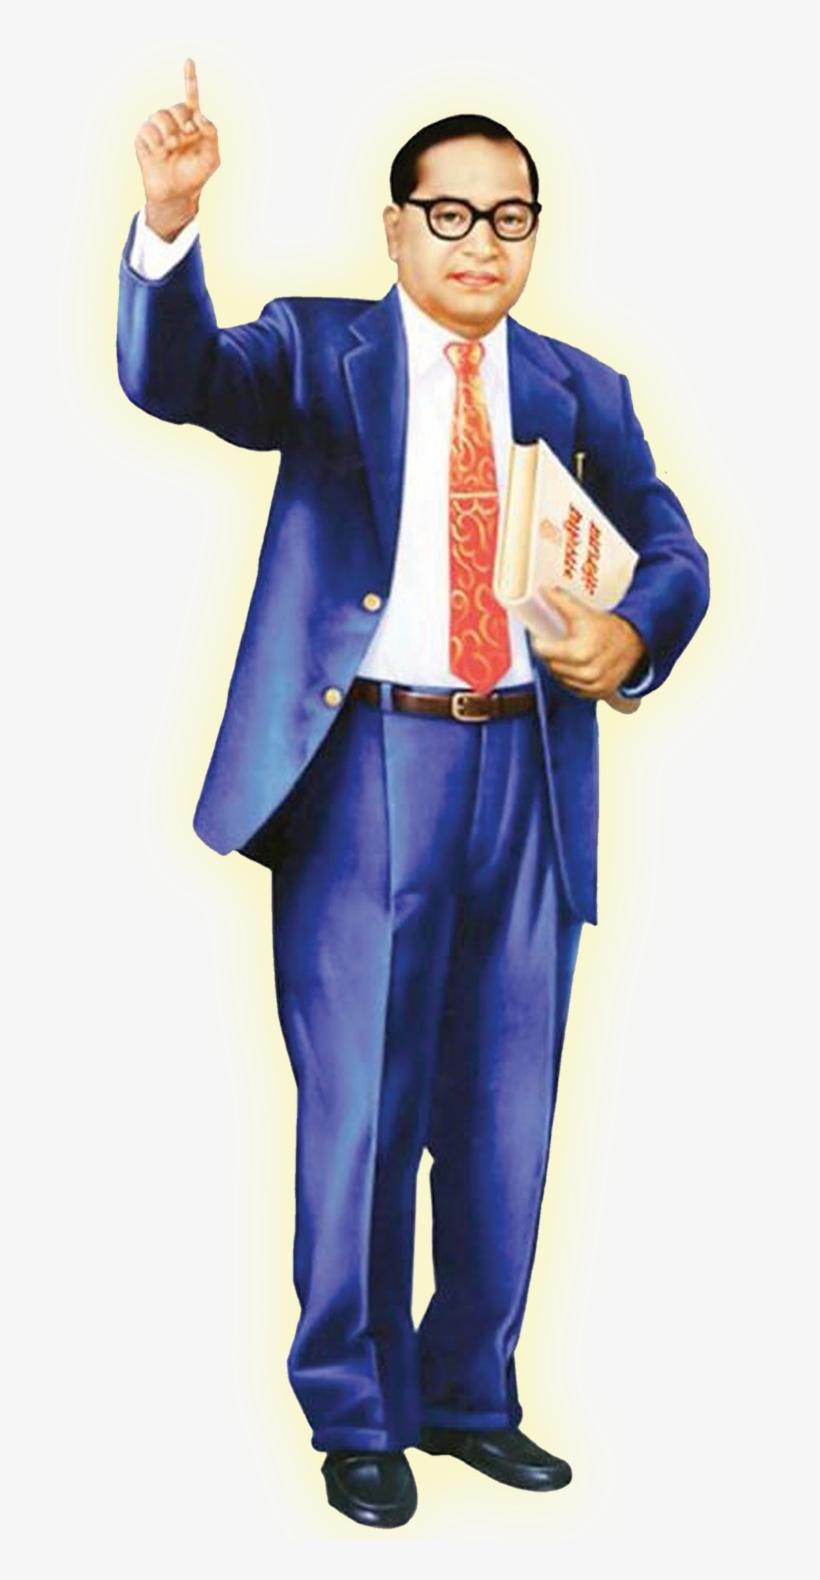 Babasaheb Ambedkar Png - Dr Babasaheb Ambedkar Full, transparent png #2443424